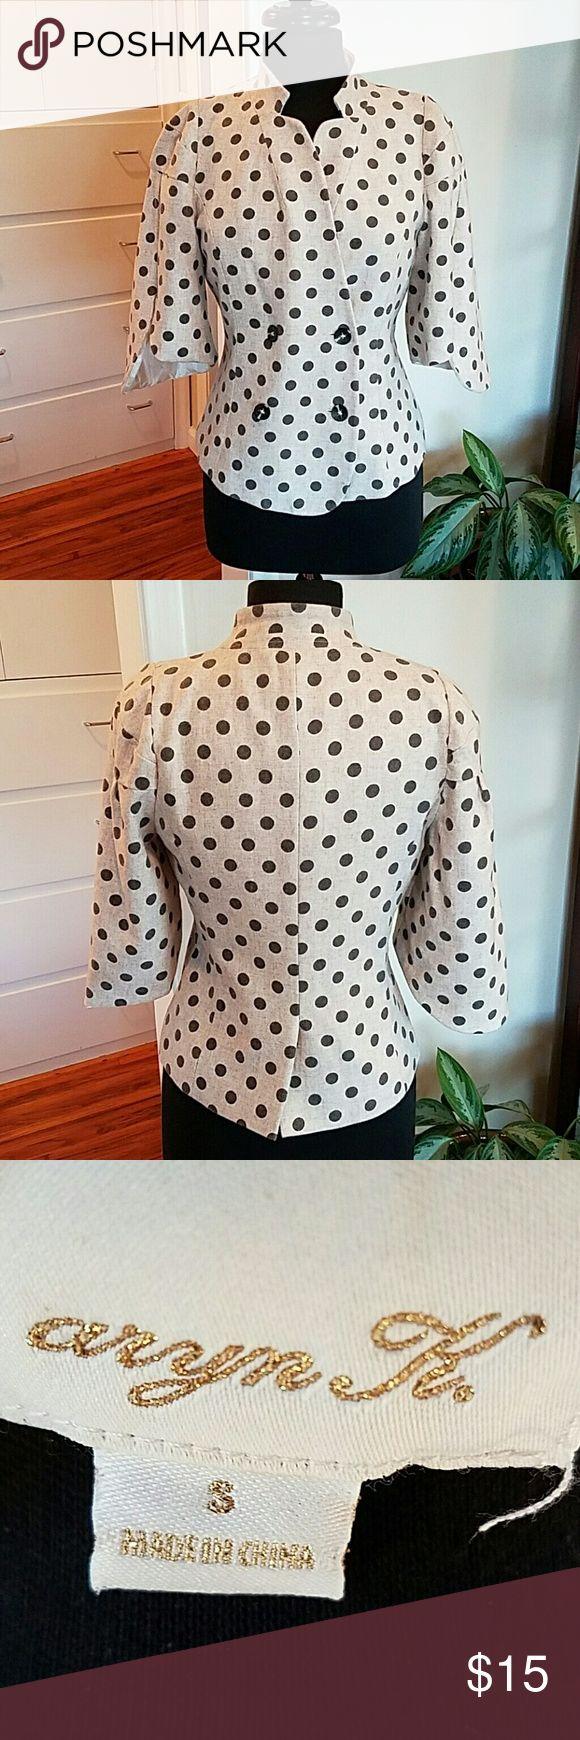 Aryn K. Polka Dot Dressy Jacket The polka dots are gray on a cream background. It has  three-quarter inch sleeves and is so cute! aryn K. Jackets & Coats Blazers